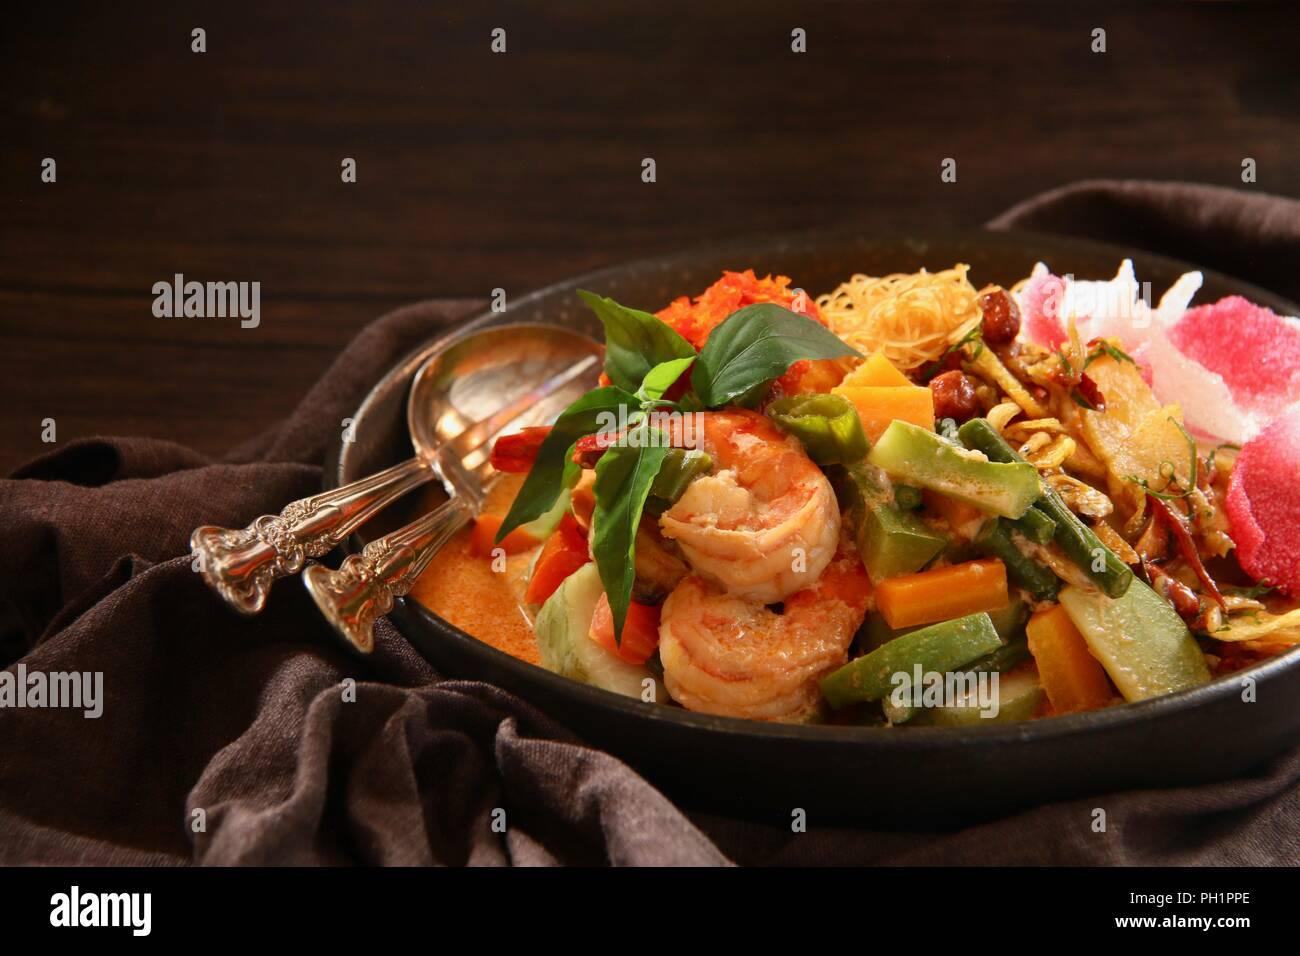 Lontong Medan, the Traditional Rice Cake Soup from Medan, North Sumatra - Stock Image